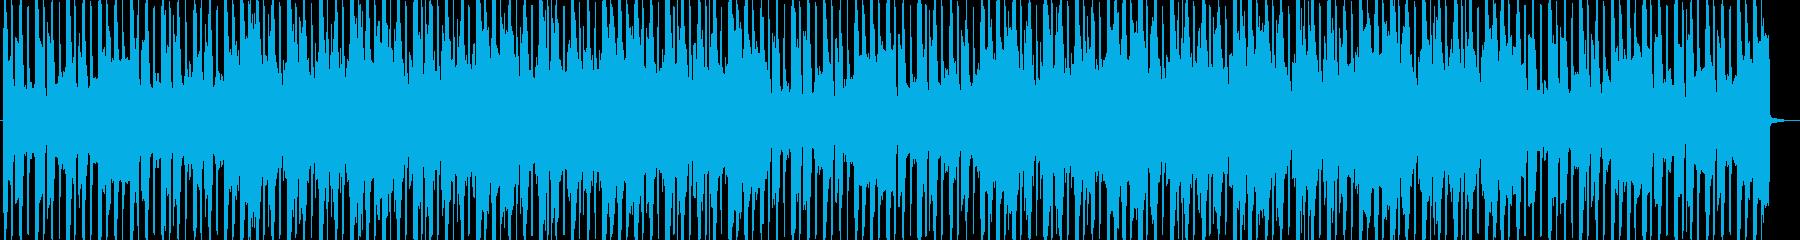 Jazzy Hiphop 3の再生済みの波形